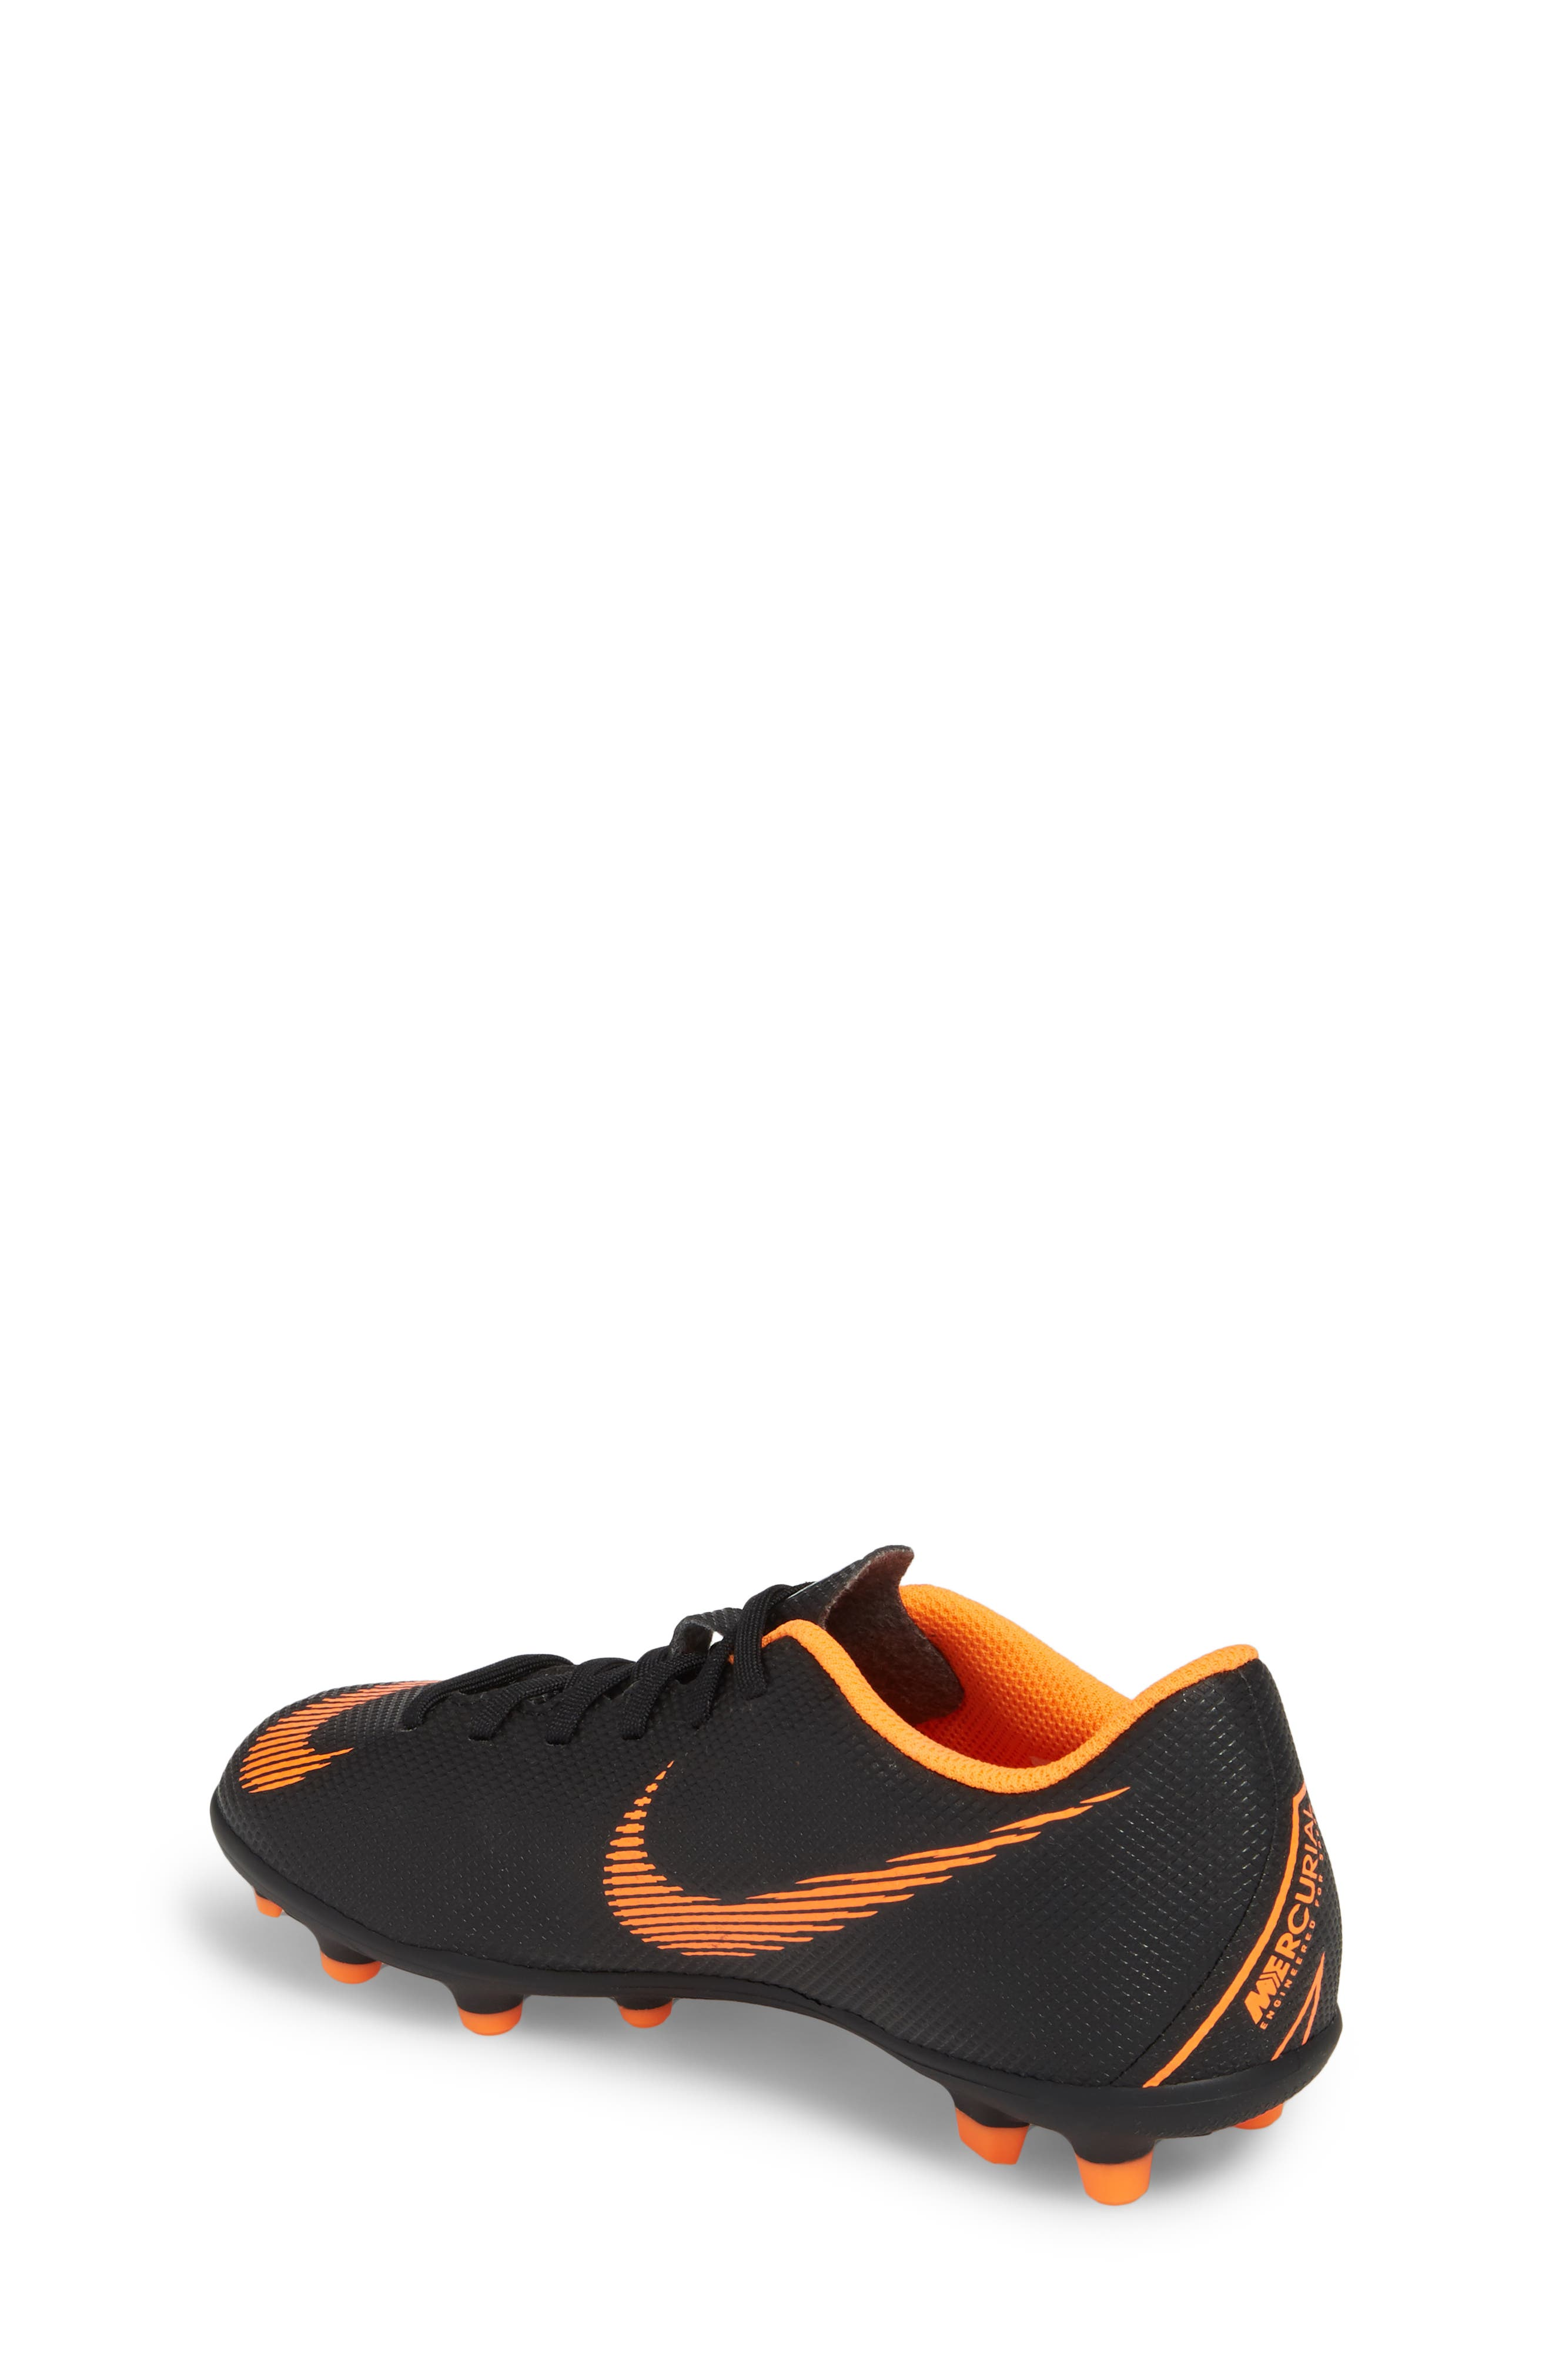 Vapor XII Club Multi Ground Soccer Shoe,                             Alternate thumbnail 2, color,                             004